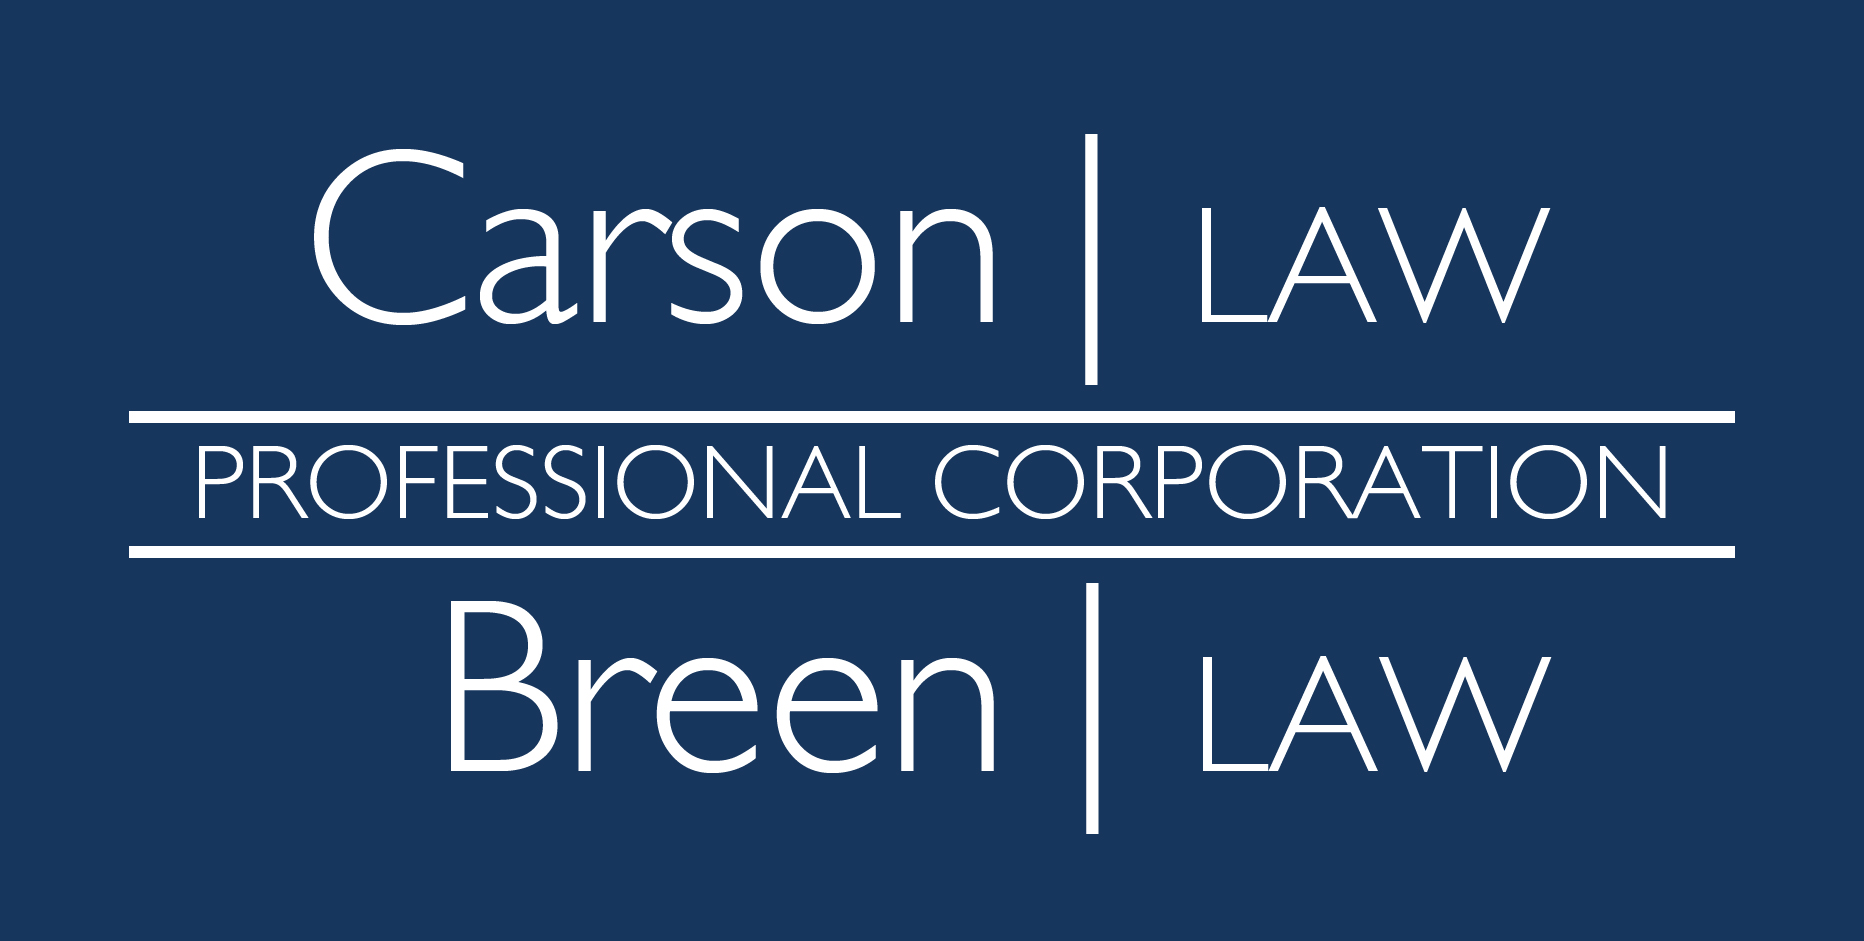 Carson-Breen-LAW-PC.jpg